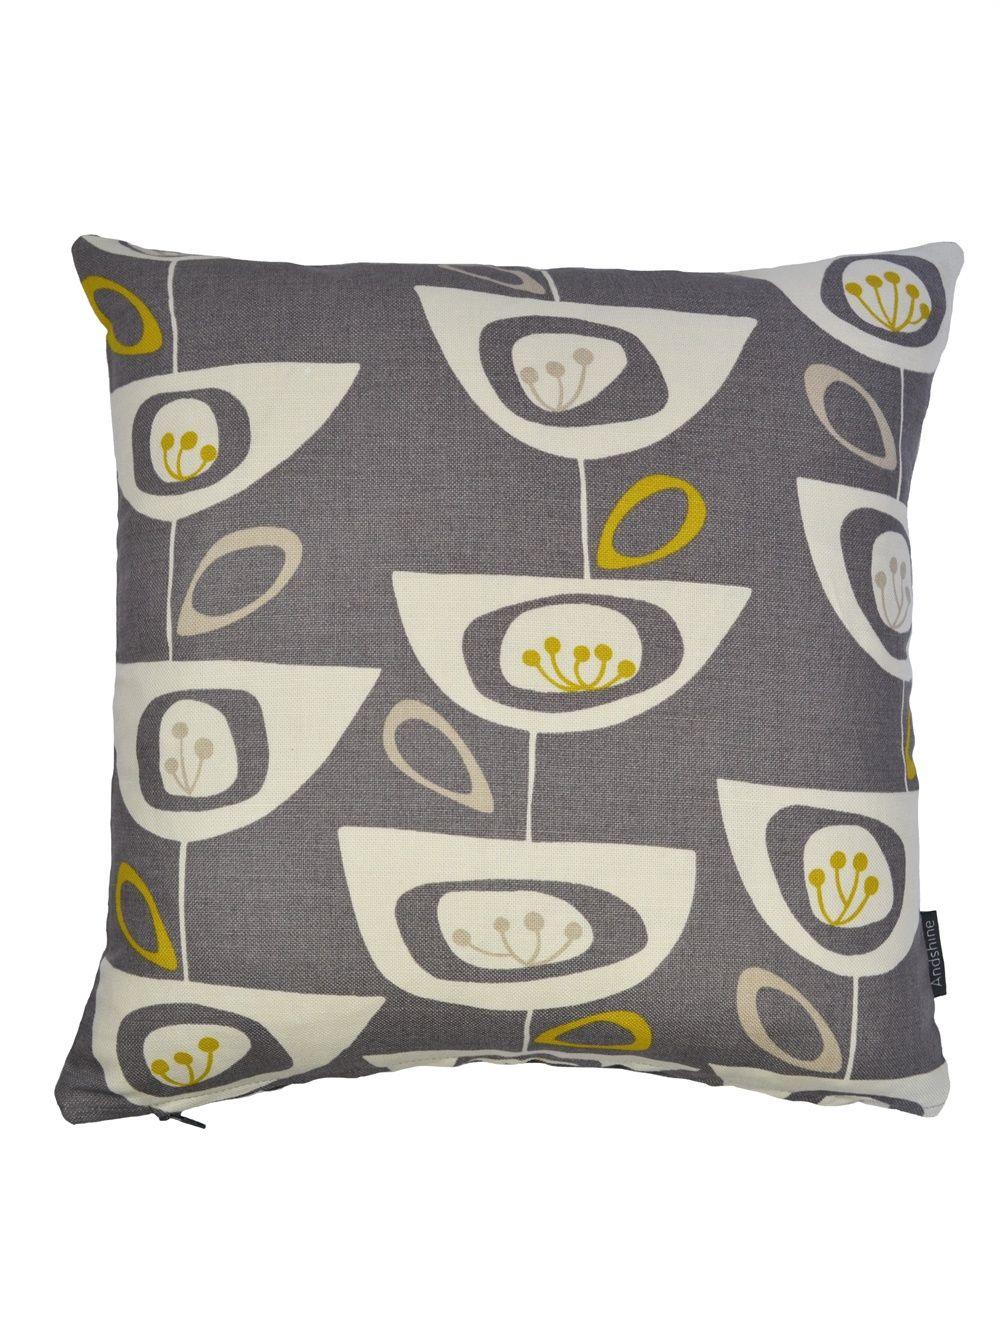 Retro seed head fabric cushion cover steel grey living ue cushion